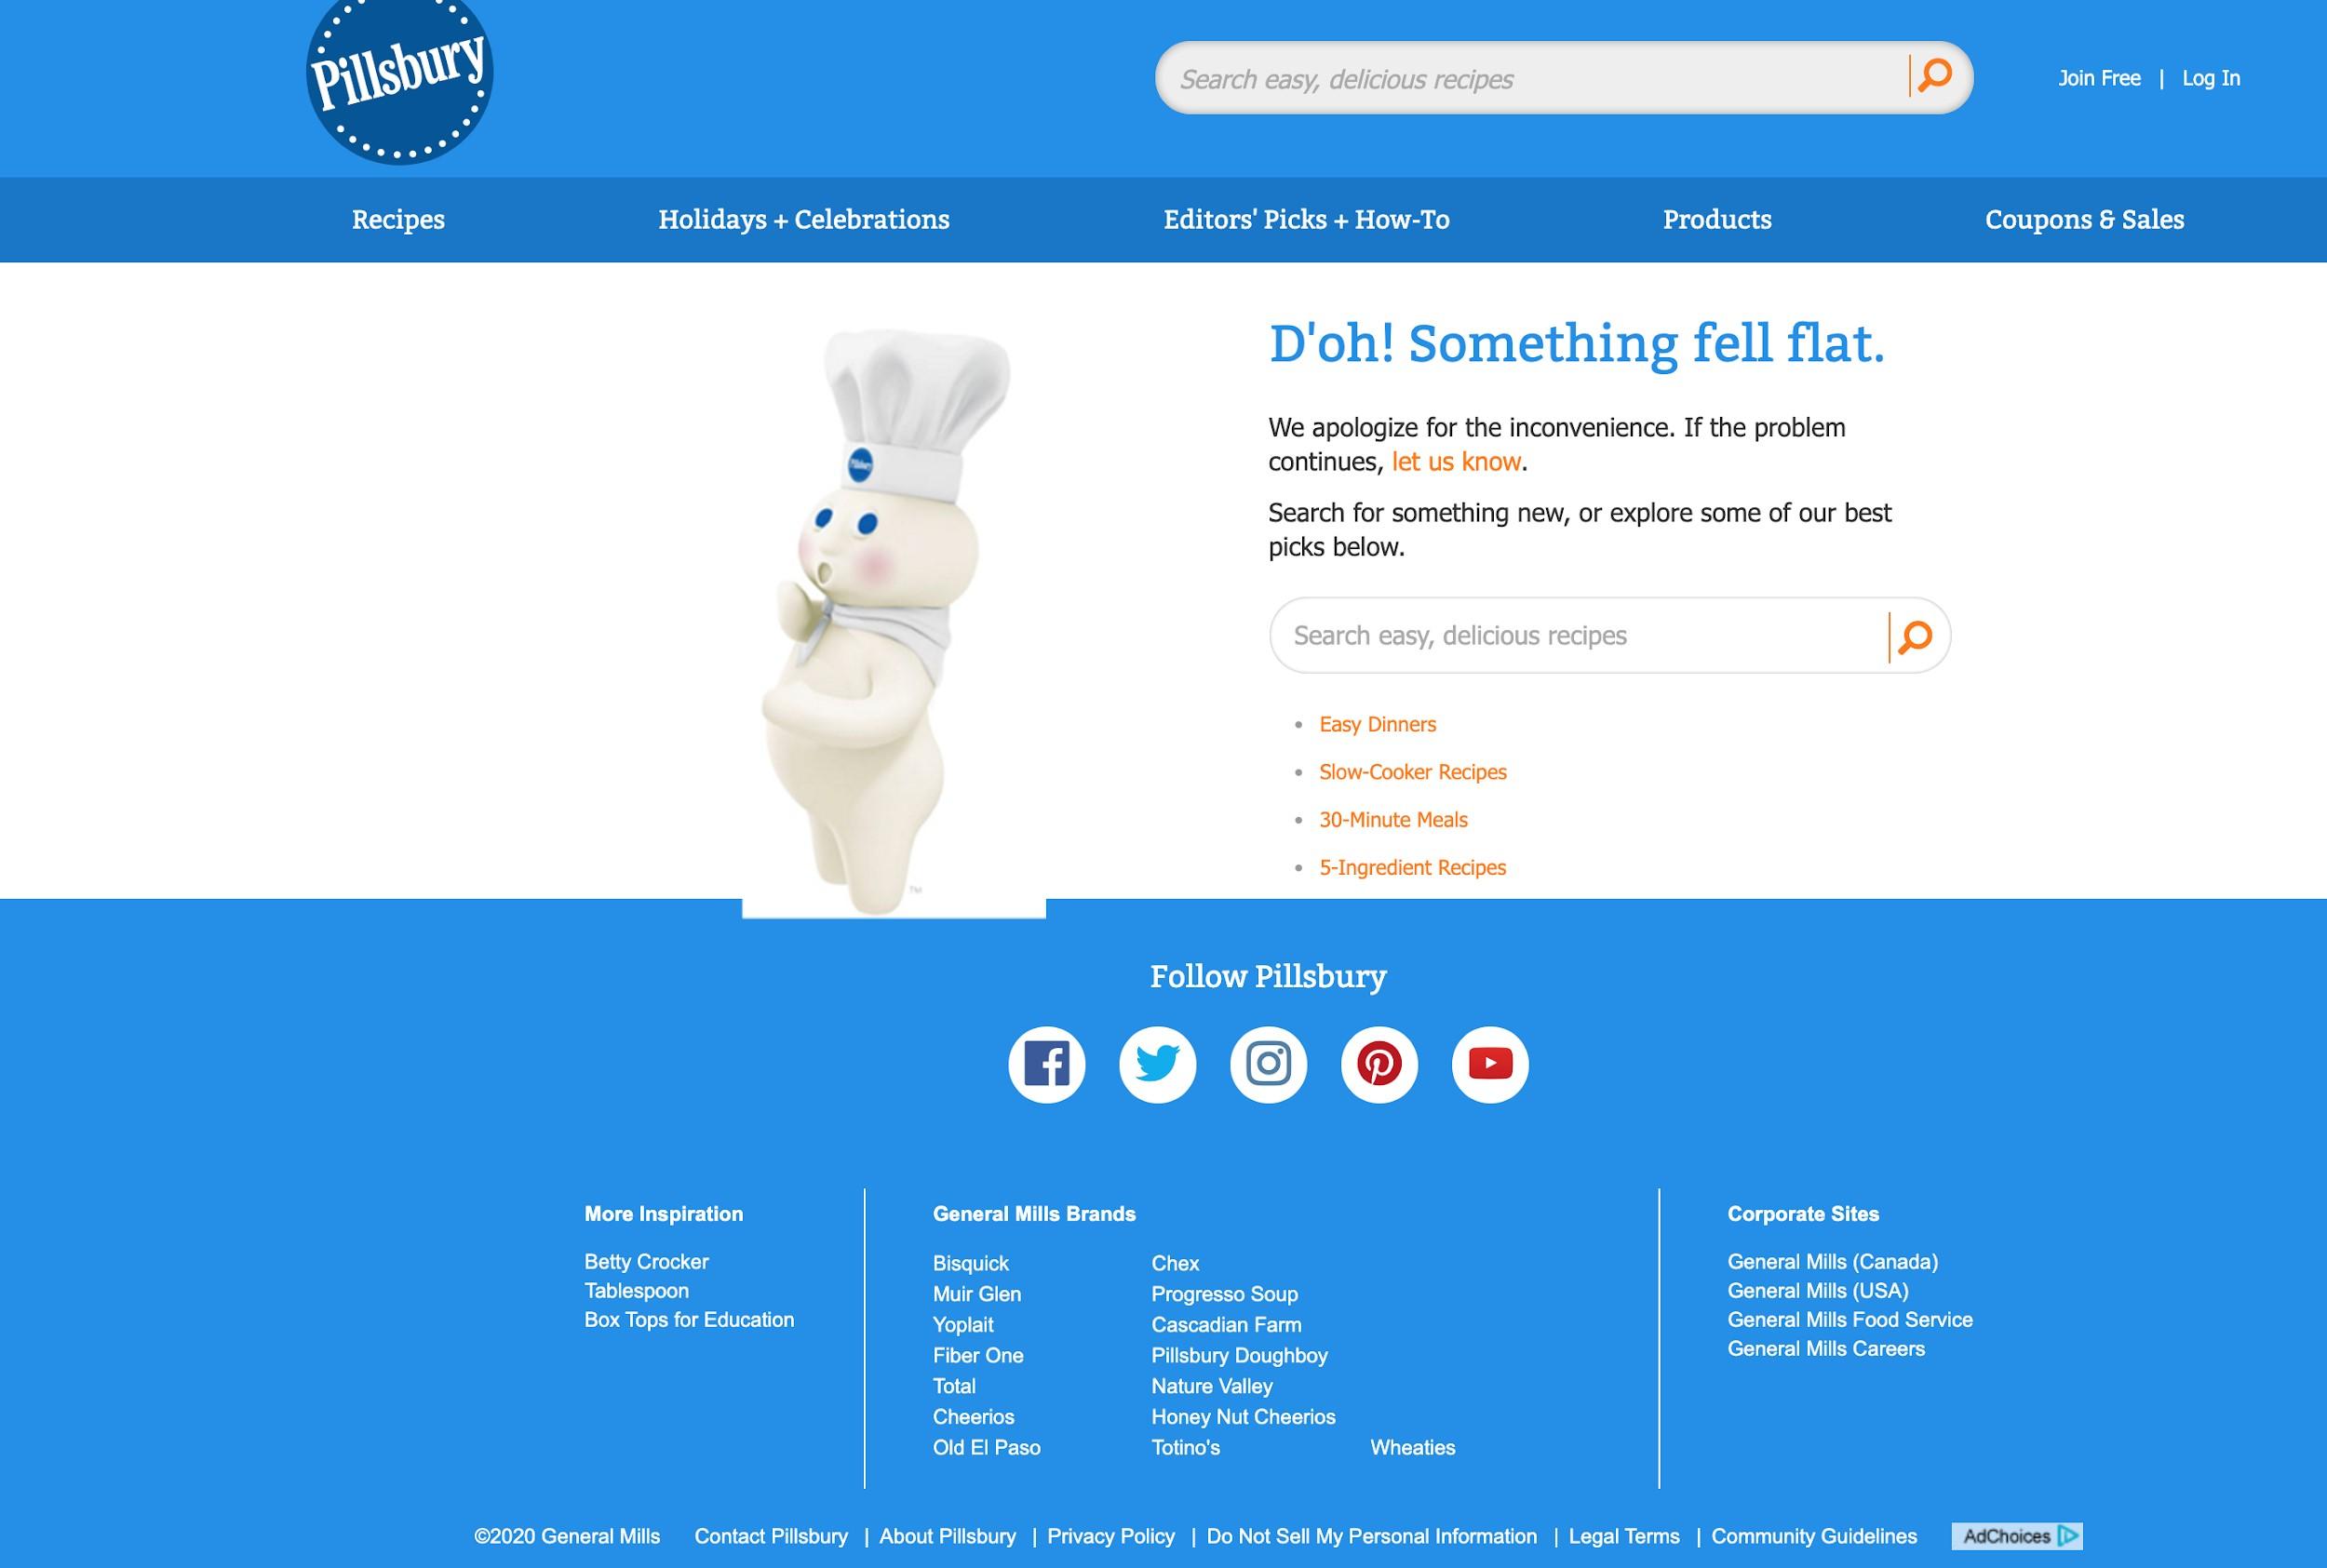 Pillsbury Webpage Error